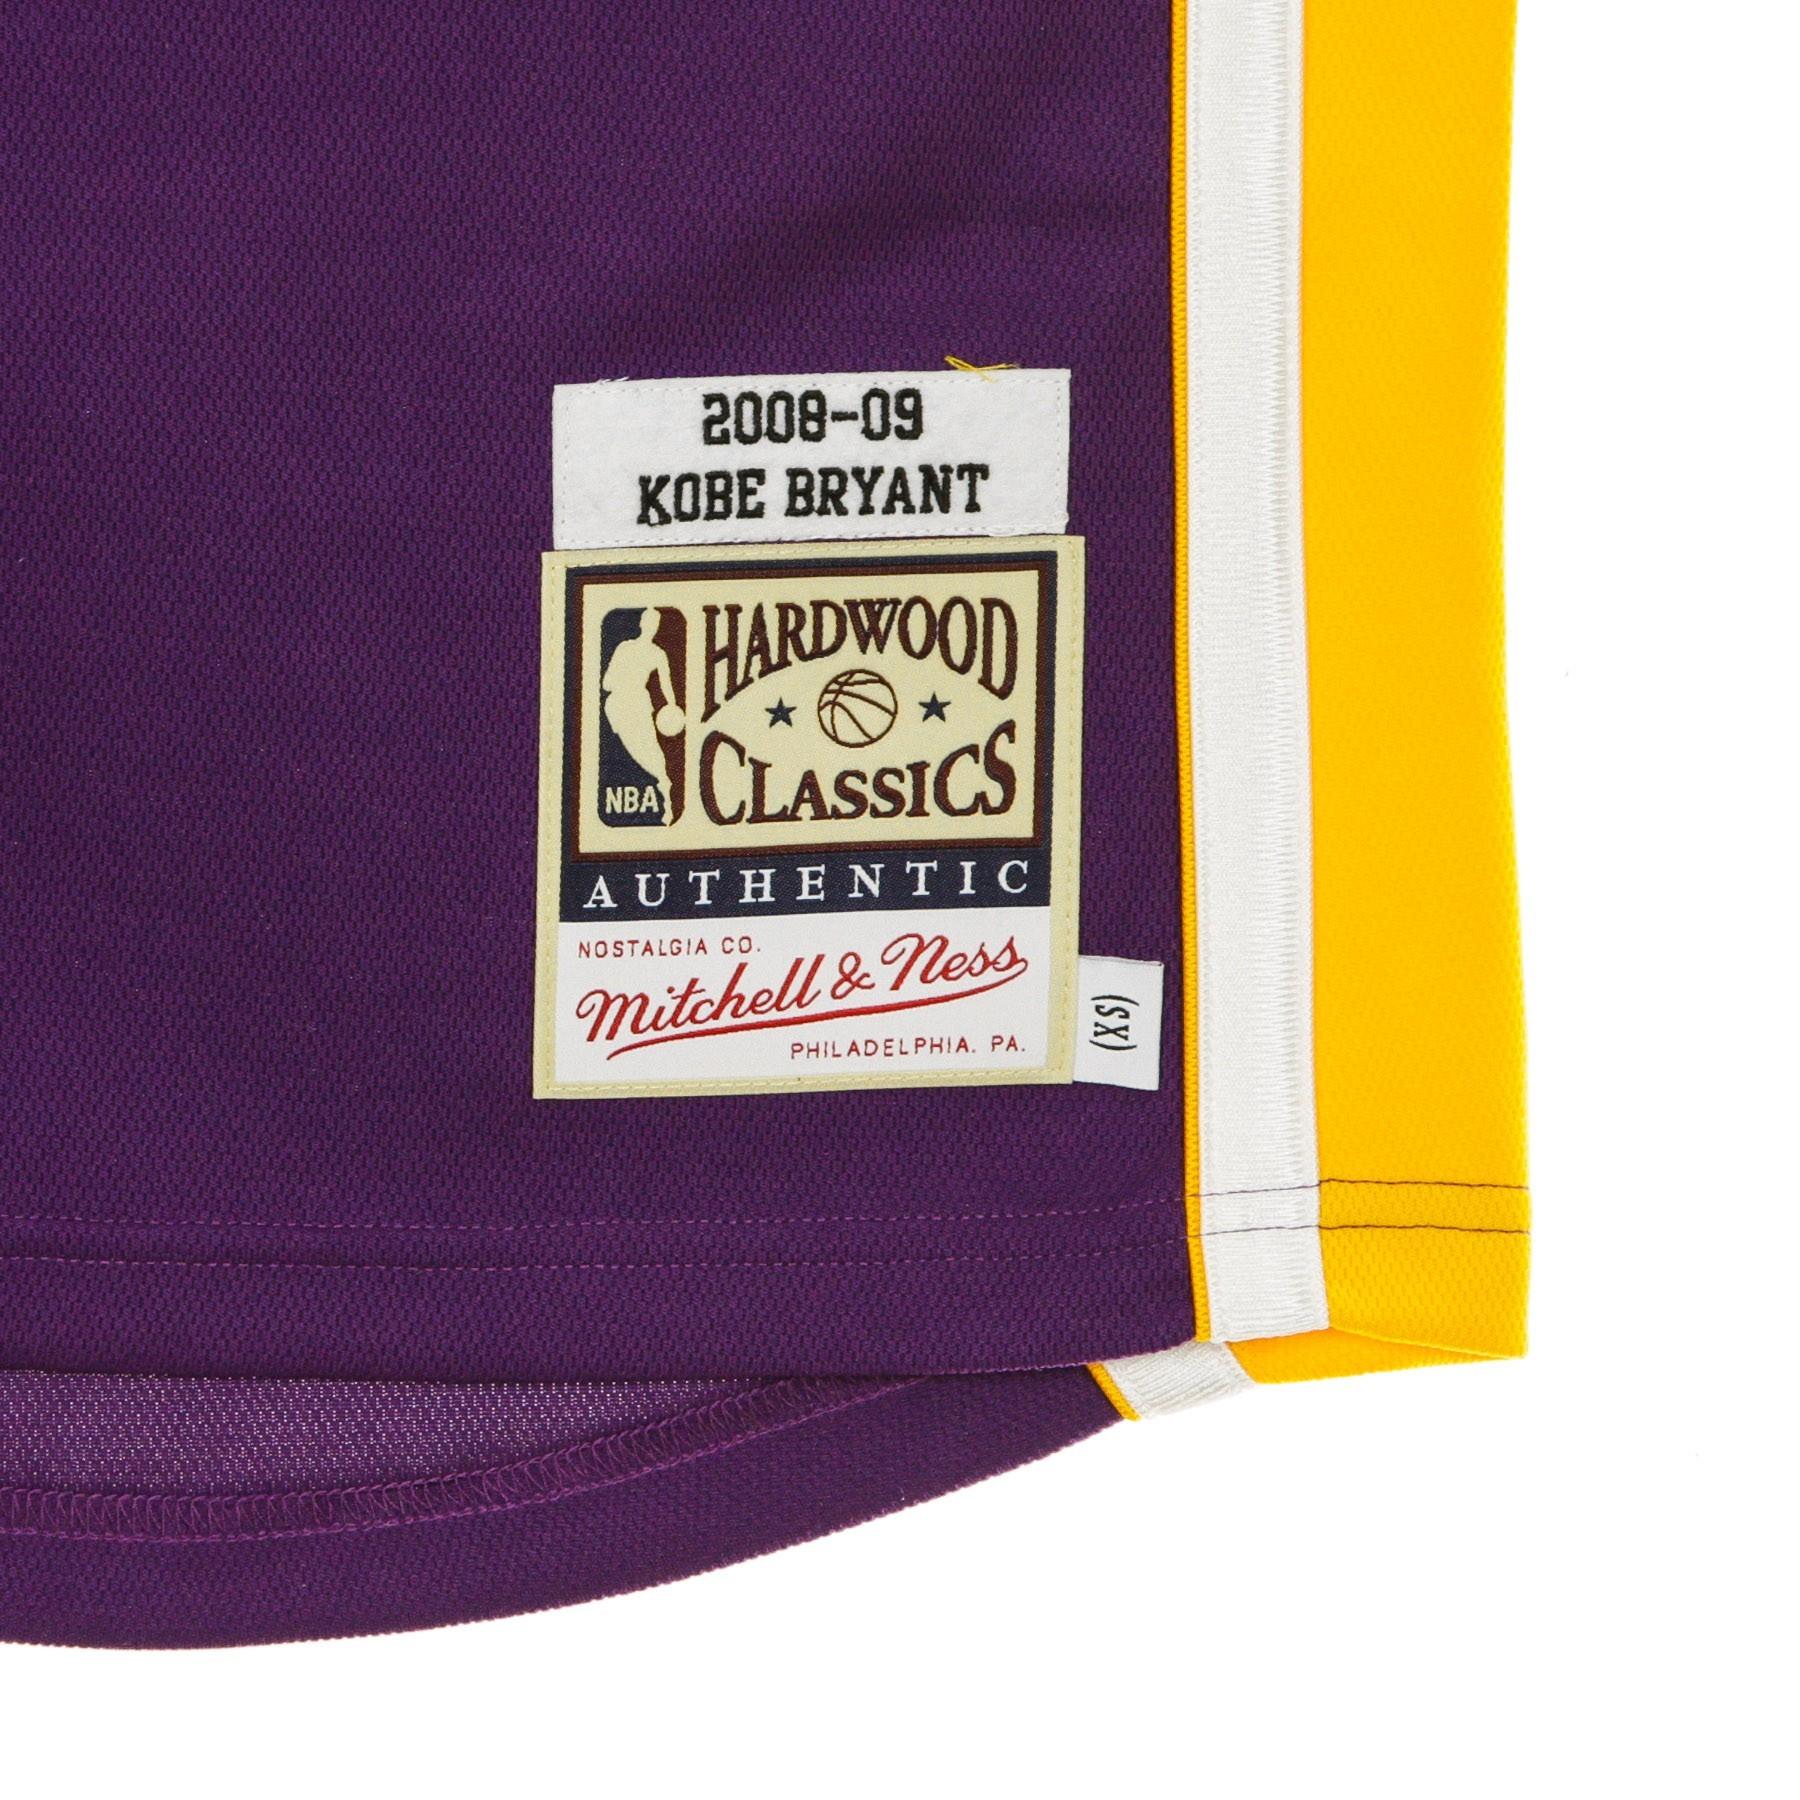 CANOTTA BASKET NBA AUTHENTIC JERSEY HARDWOOD CLASSICS NO24 KOBE BRYANT 2008-09 LOSLAK ROAD